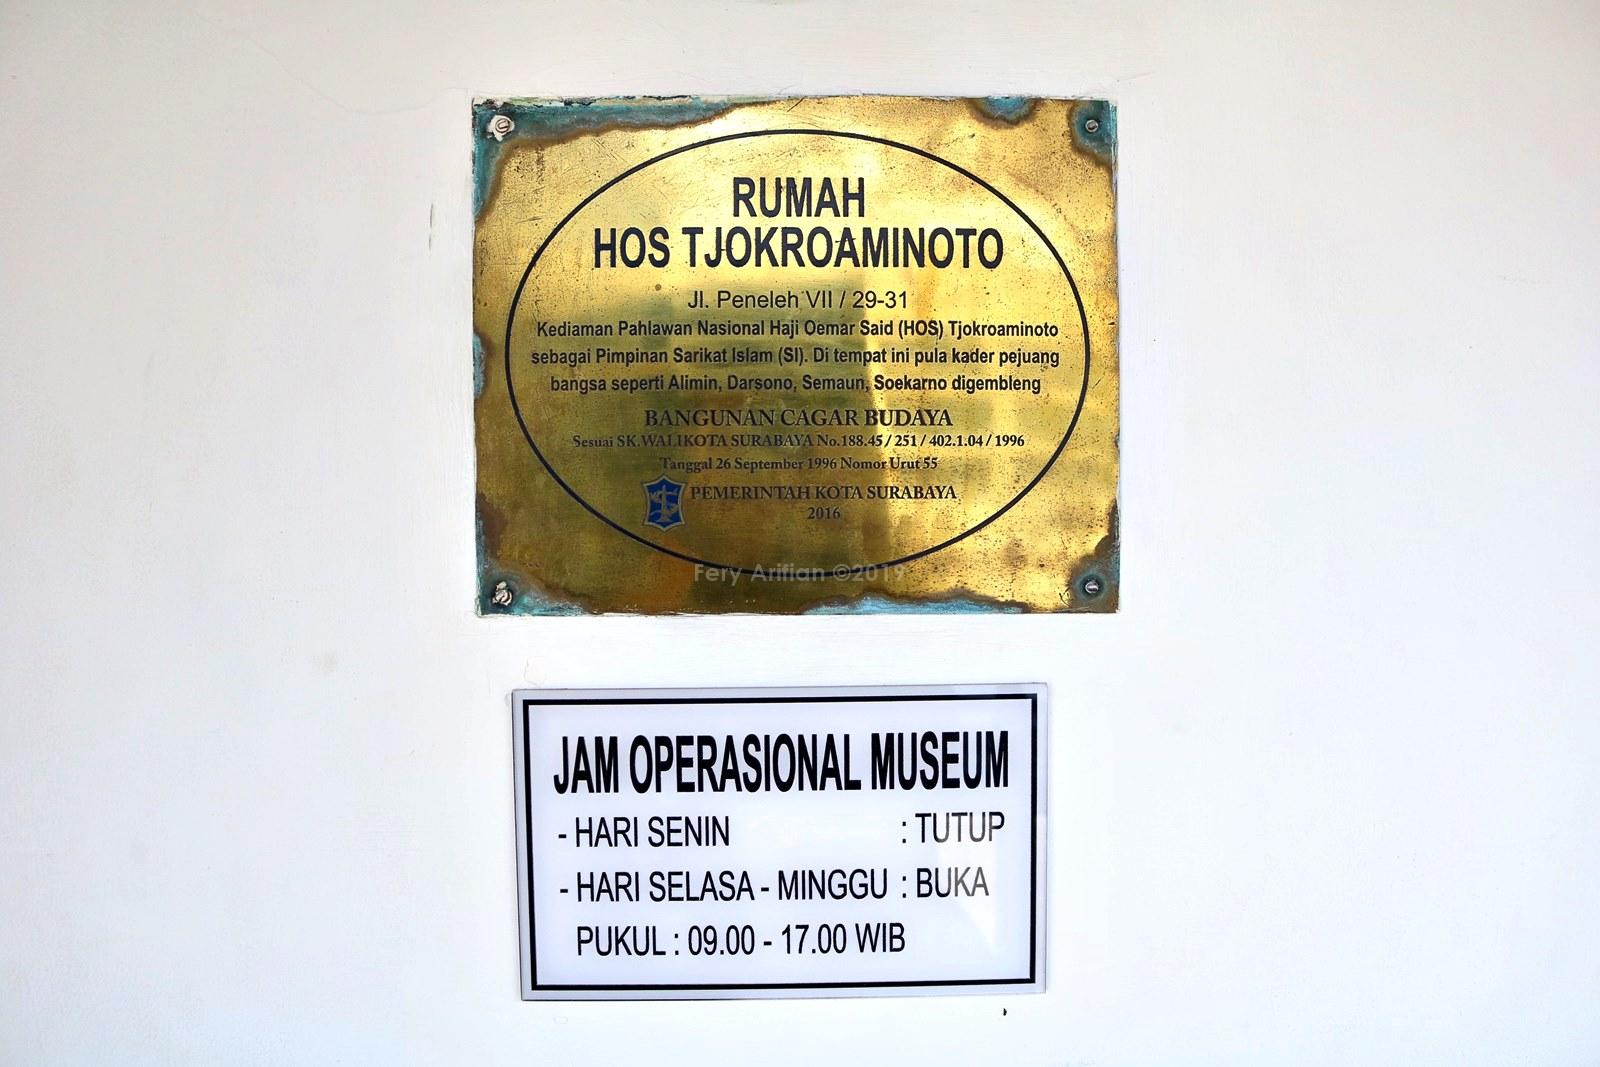 Rumah HOS Tjokroaminoto - Cagar Budaya Surabaya | Travel Blogger Malang